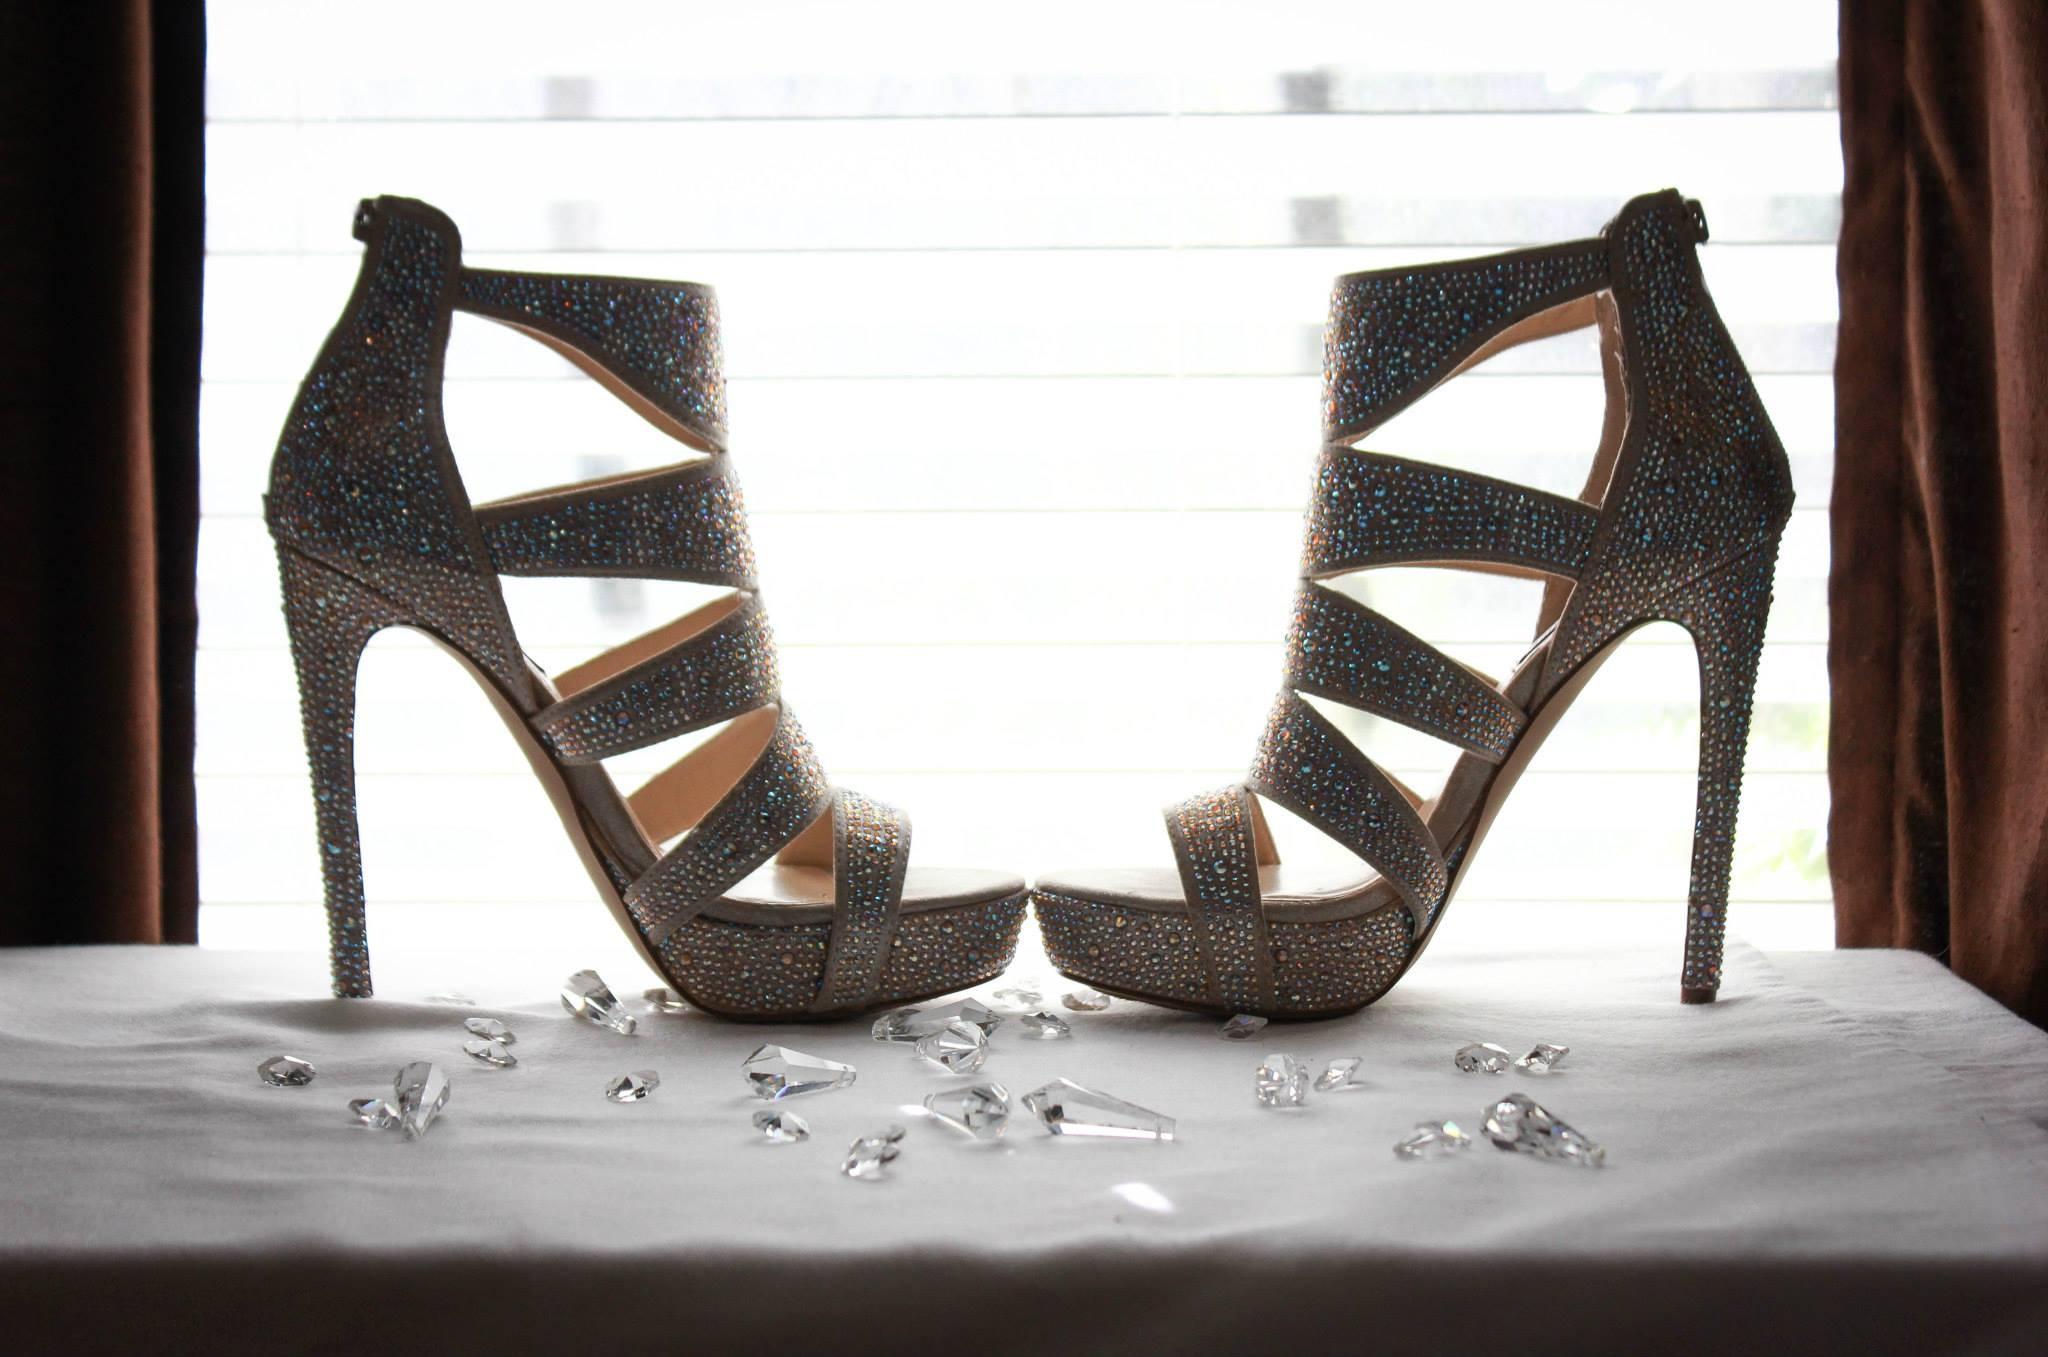 Nis shoes photo.JPG